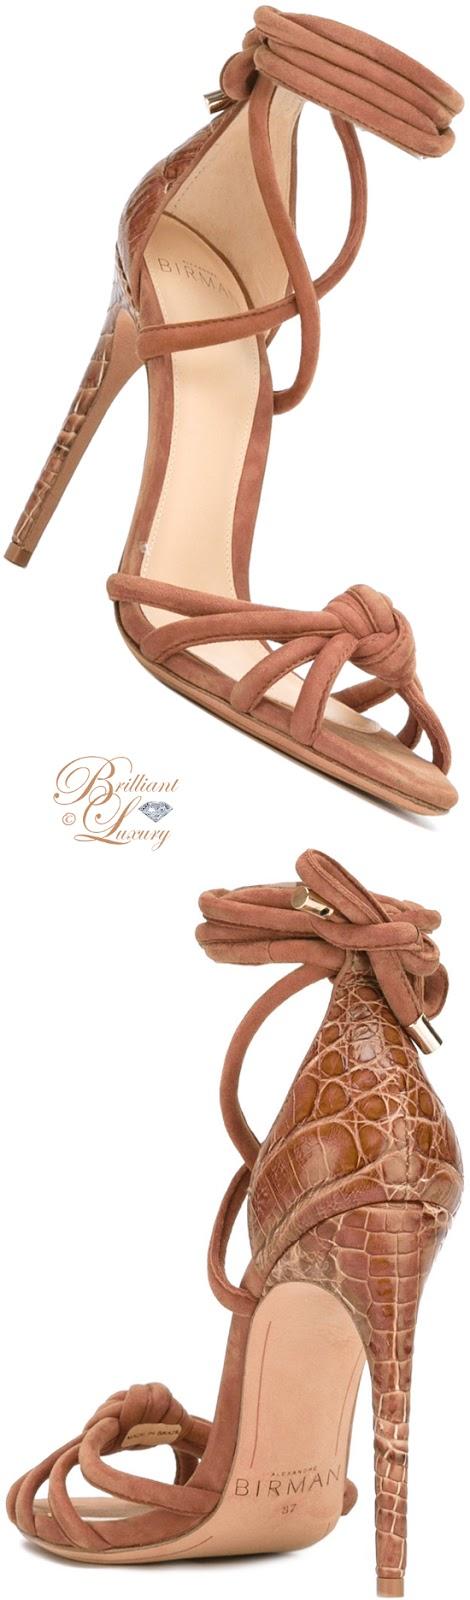 Brilliant Luxury ♦ Alexandre Birman Lanna Ankle-Wrap Sandals